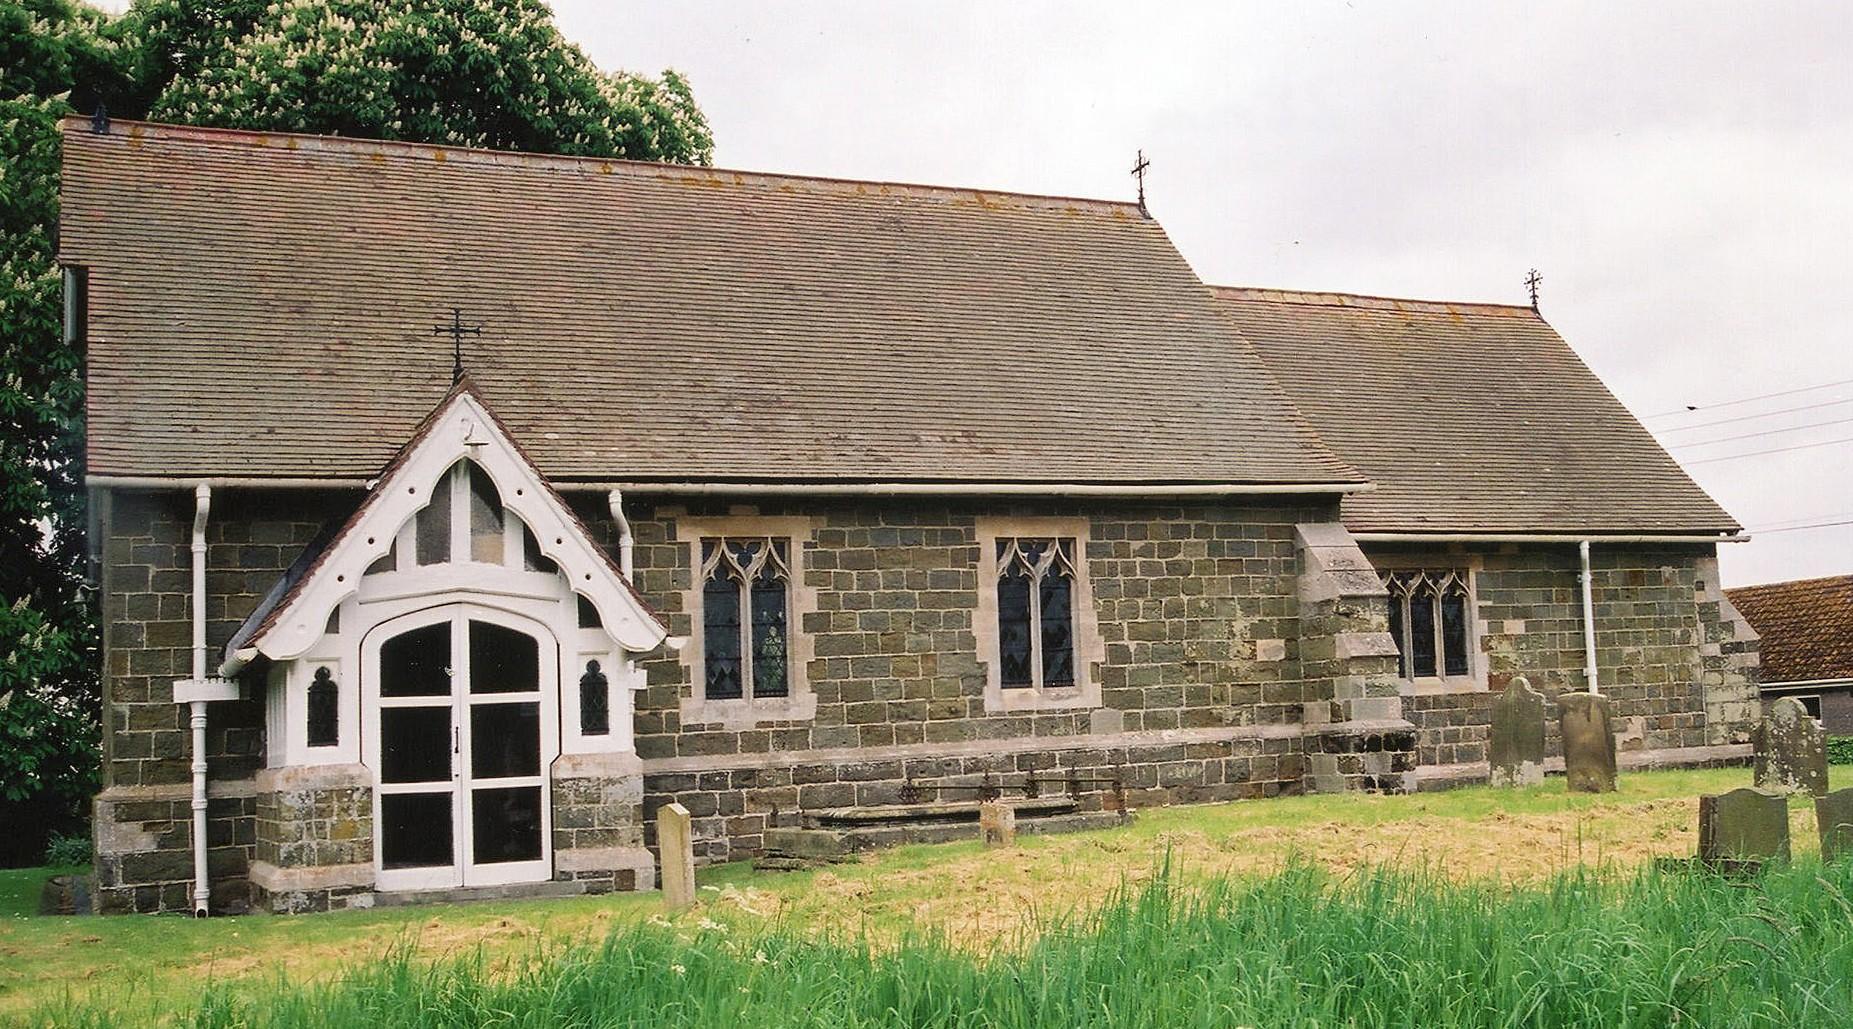 St. Wilfred's church